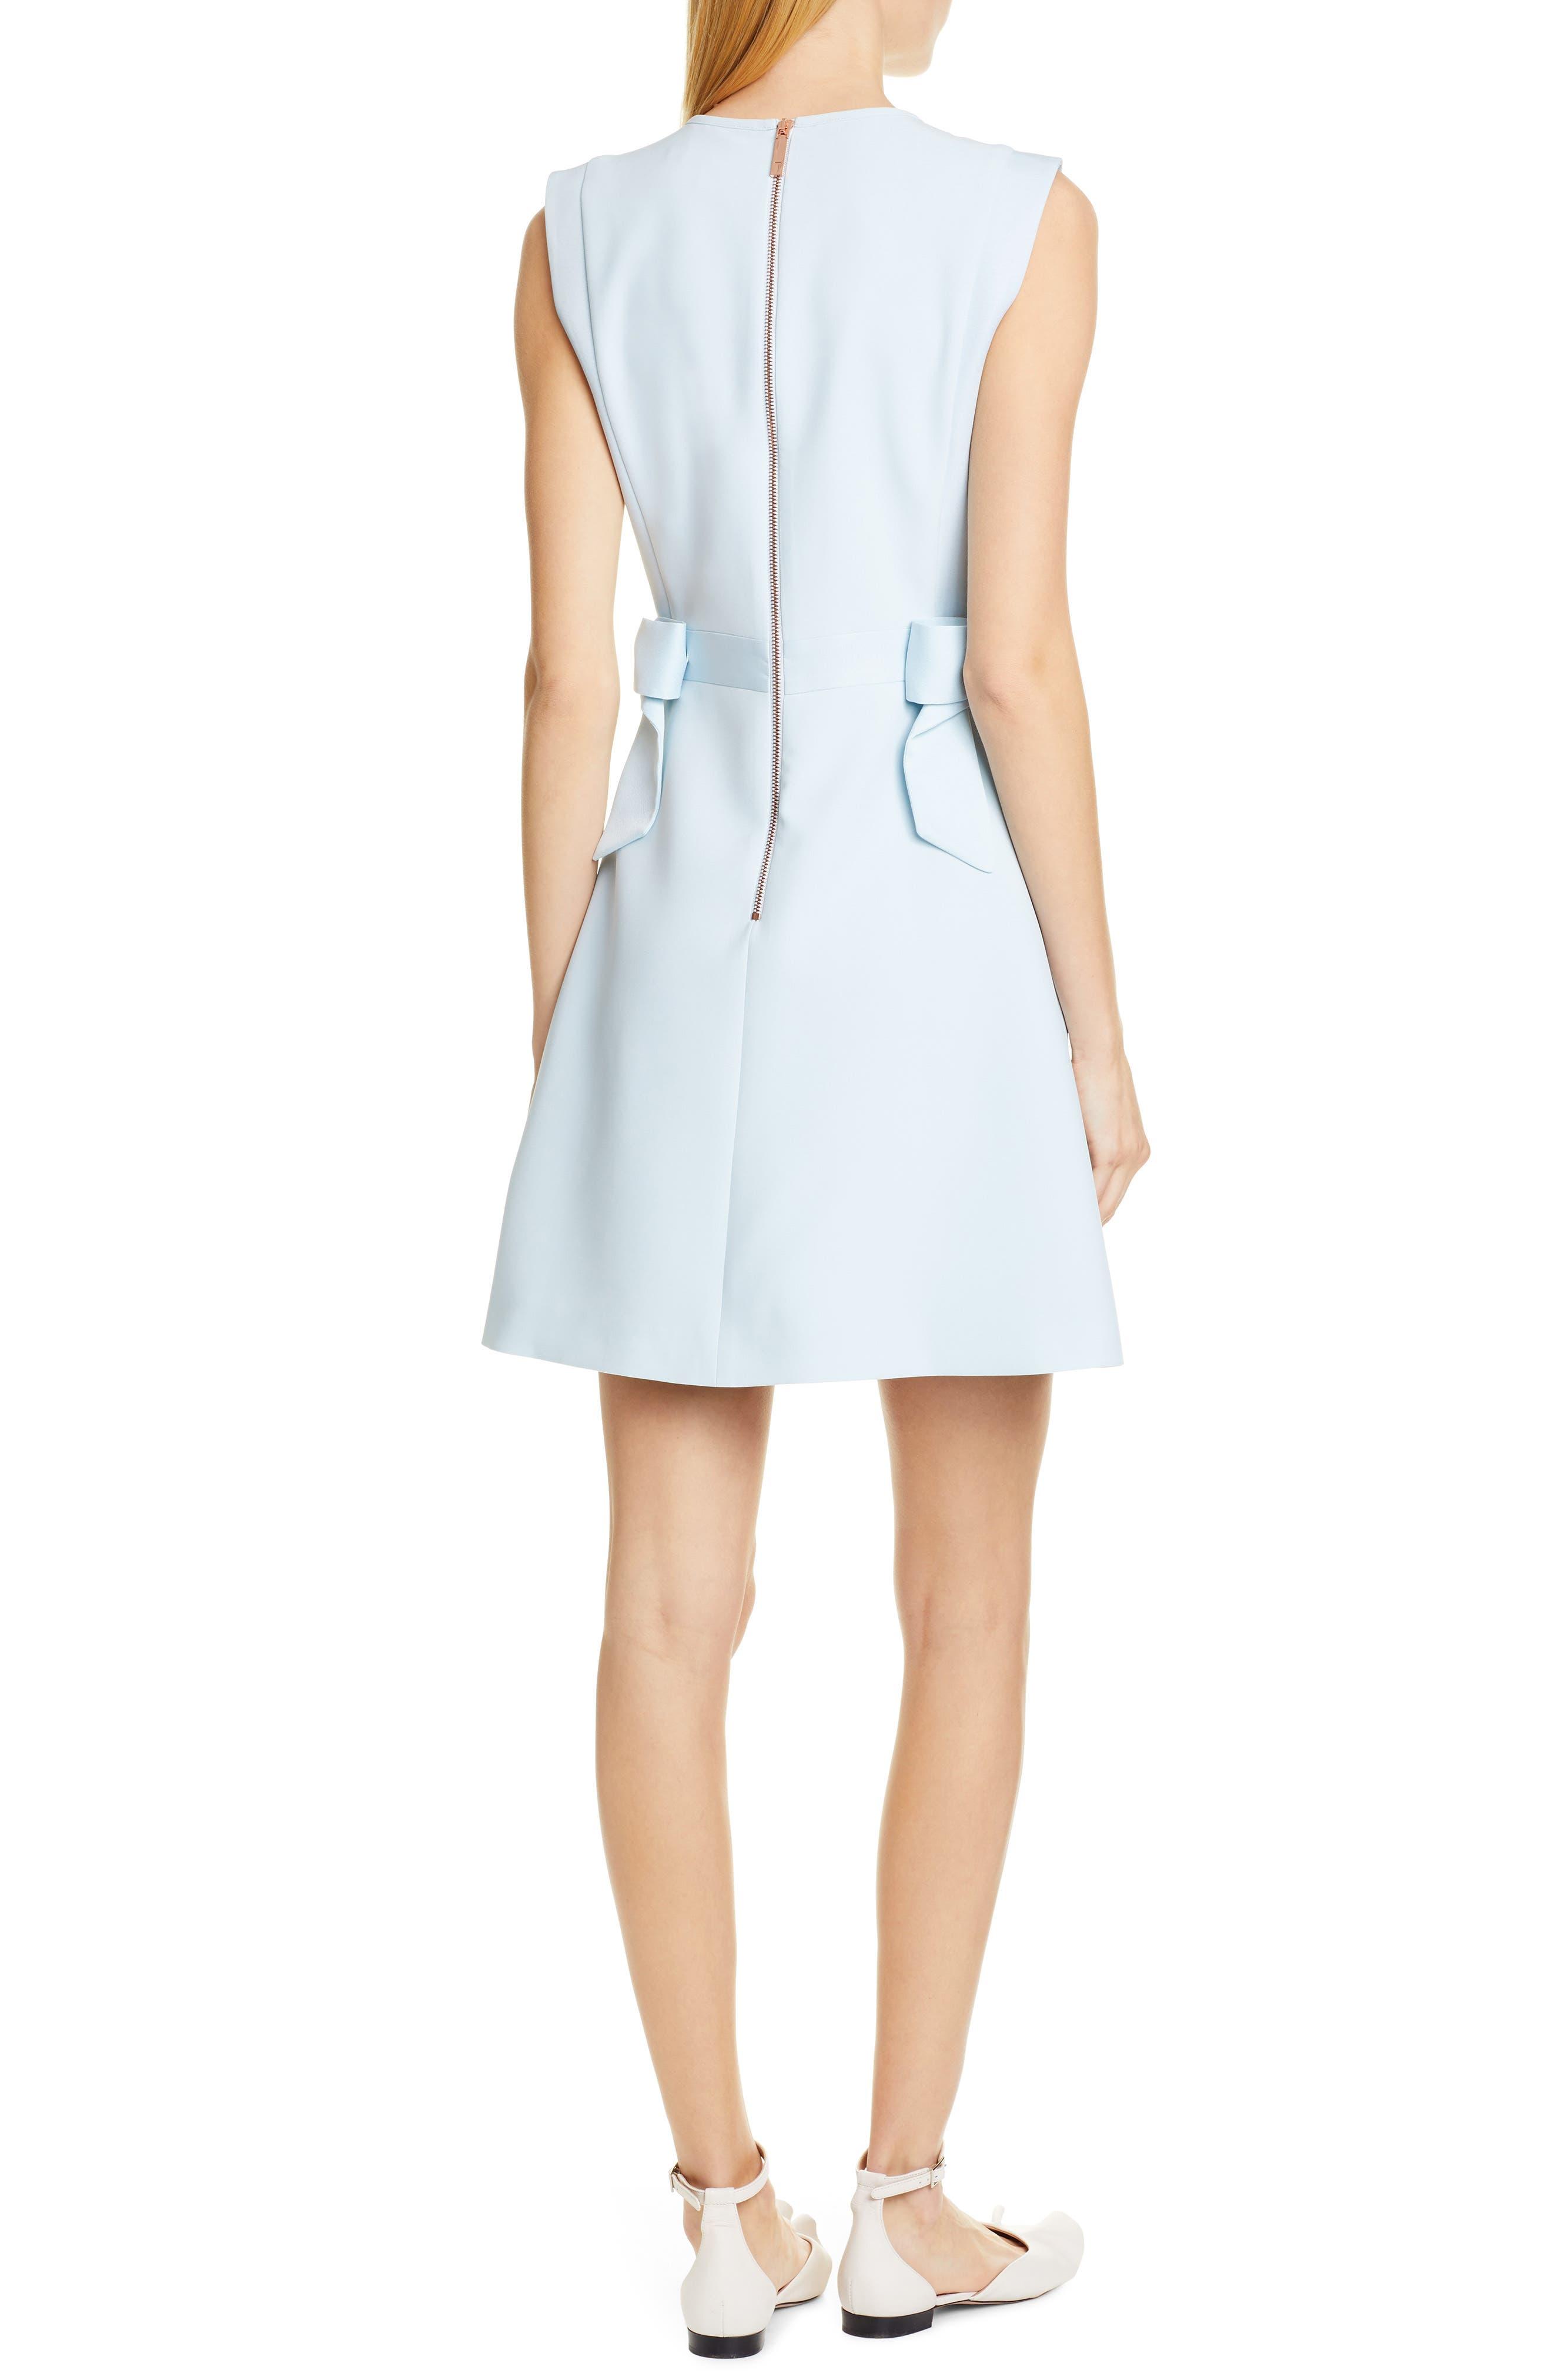 TED BAKER LONDON, Meline Side Bow Detail Dress, Alternate thumbnail 2, color, MINT